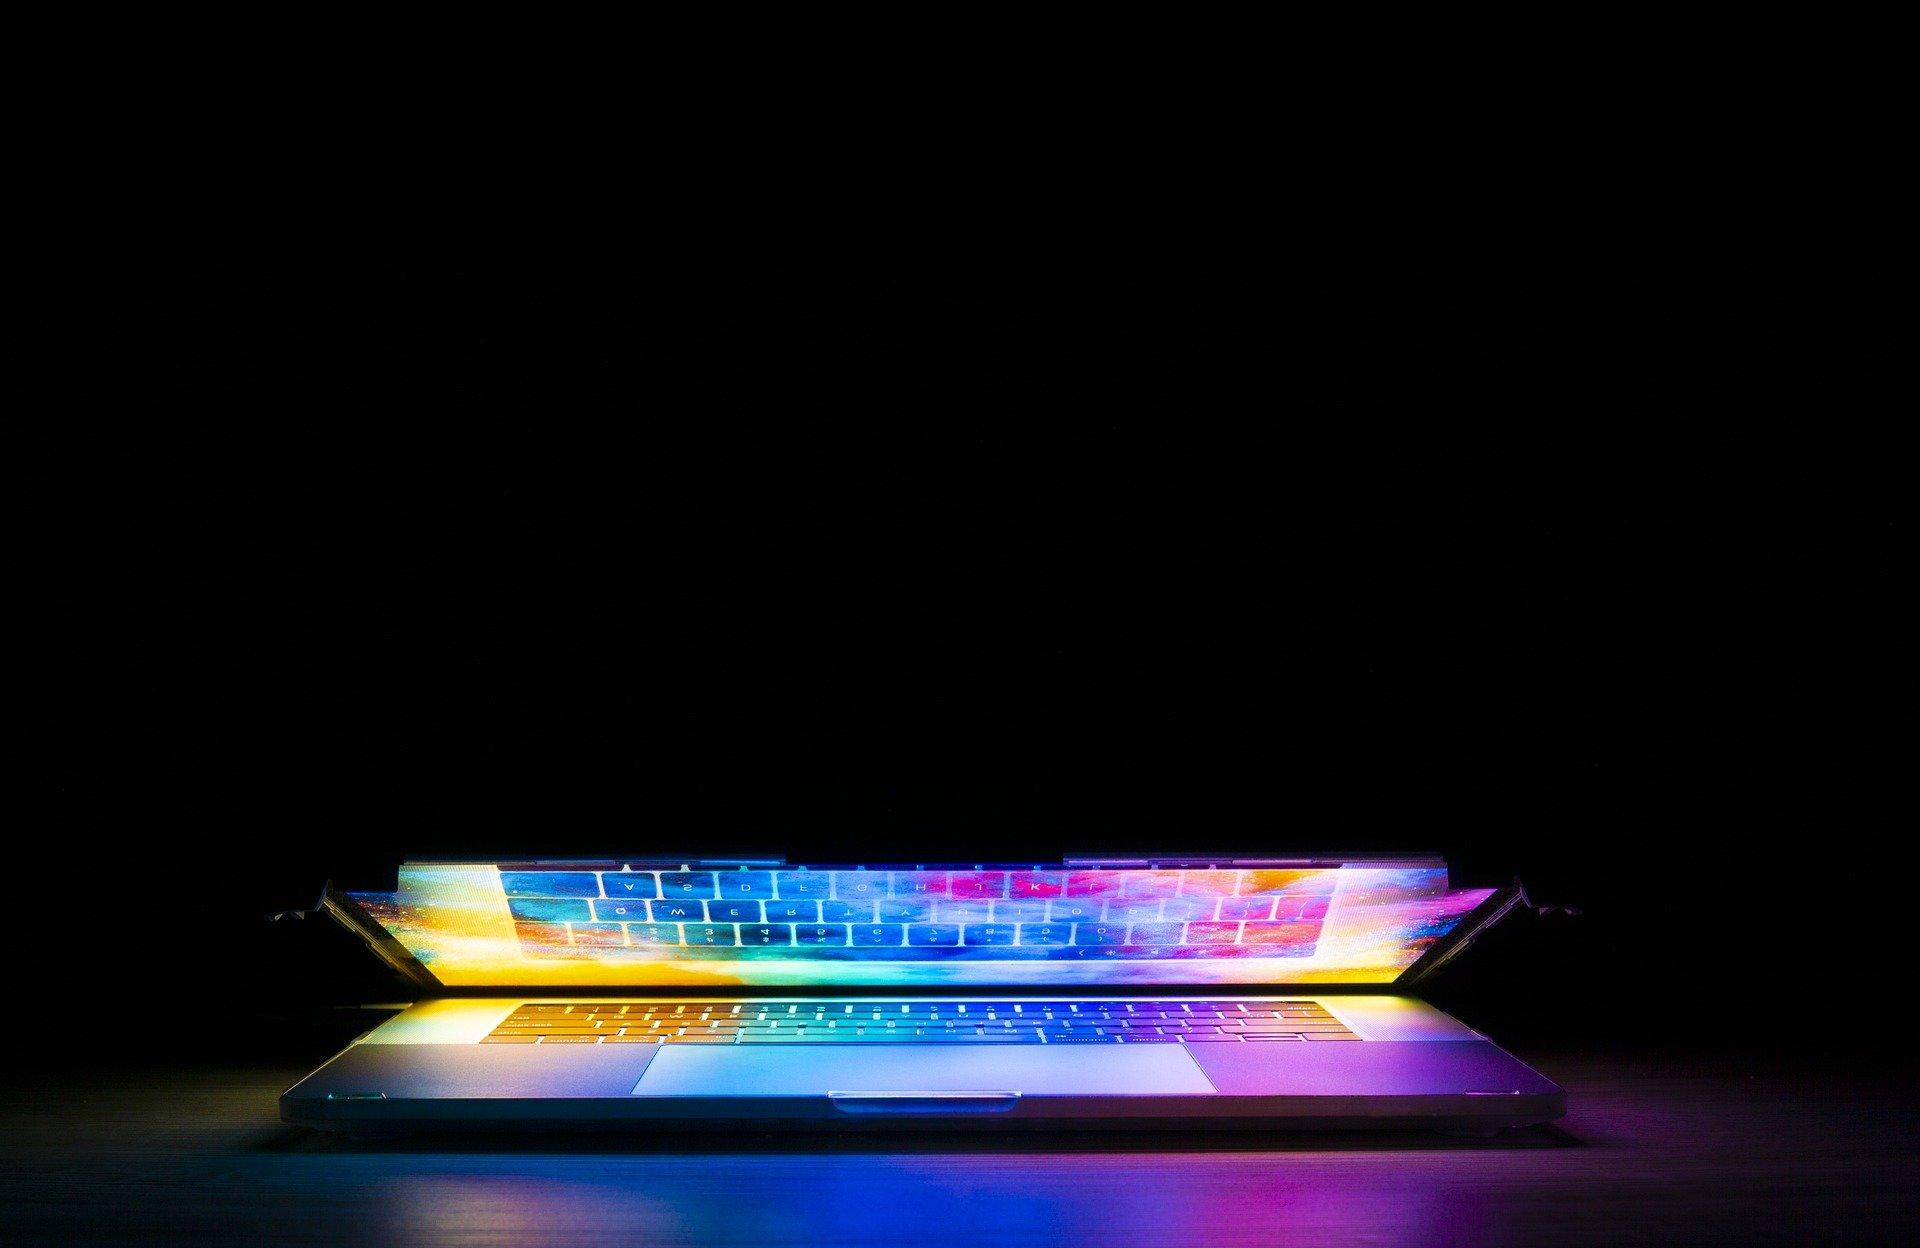 keyboard-5017973_1920 (1)